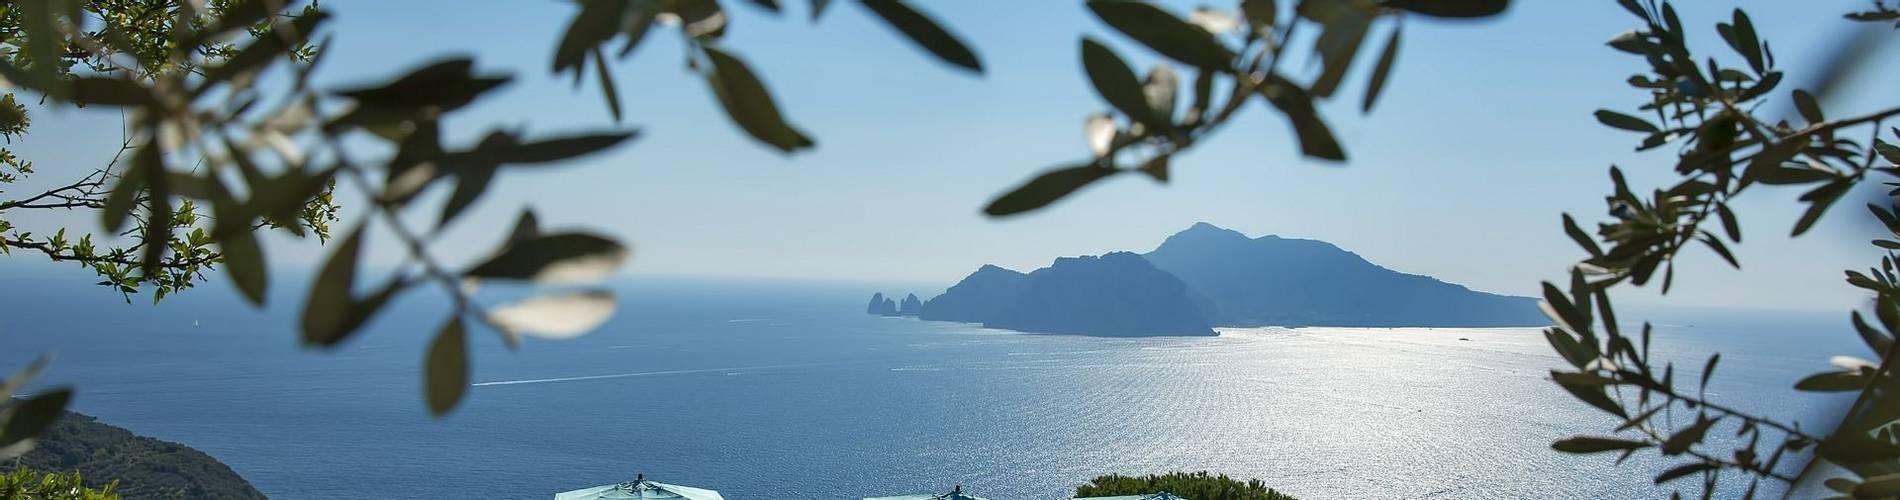 Relais Blu, Sorrento, Italy (20).jpg